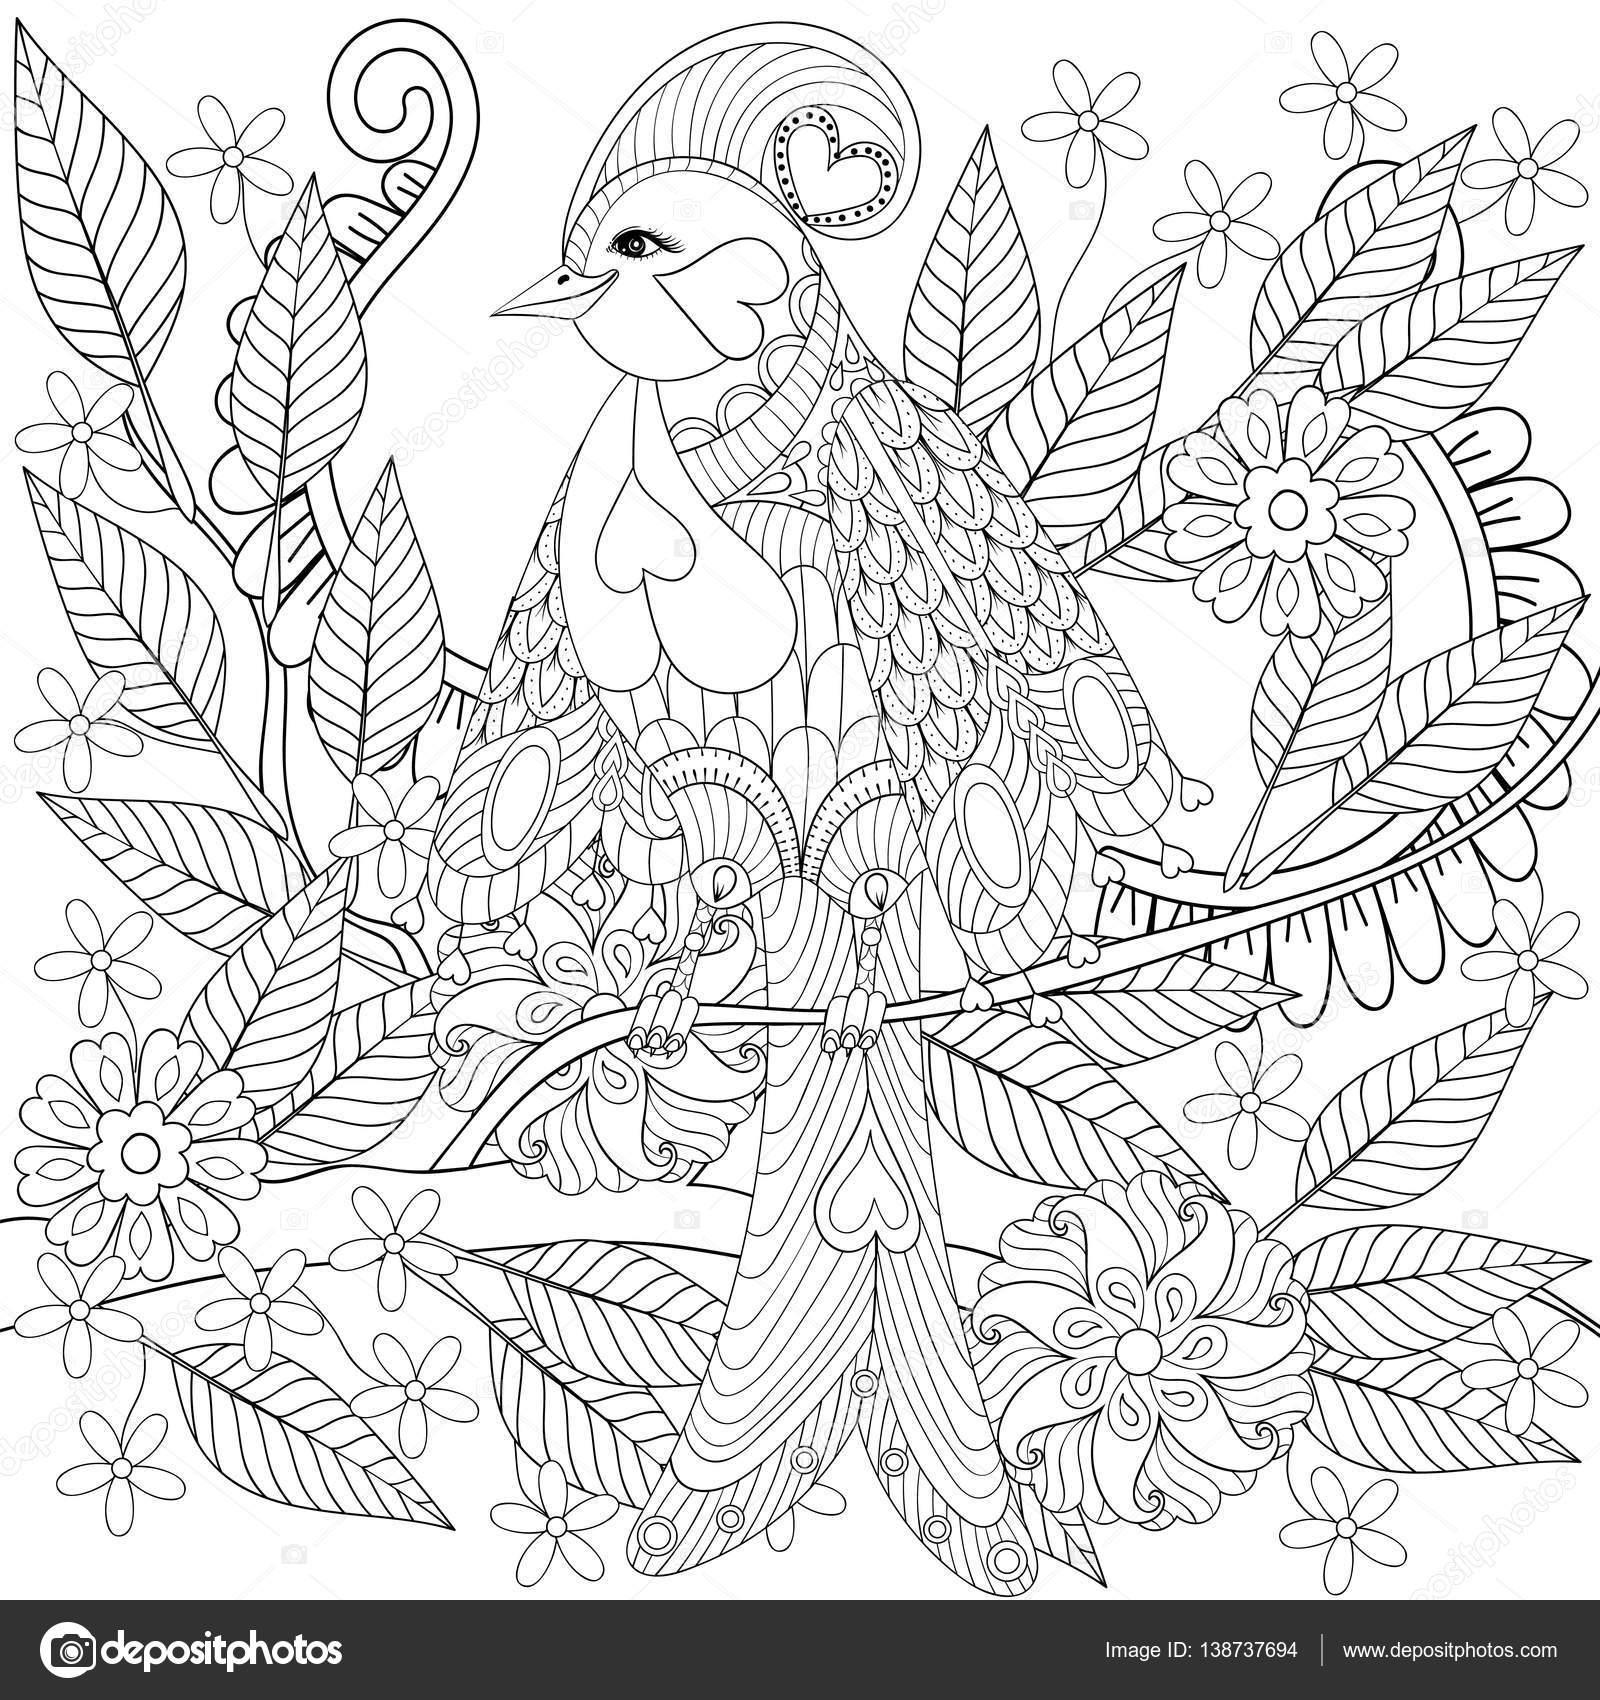 Aves exóticas tropicales zentangle sentado en la rama con flores en ...